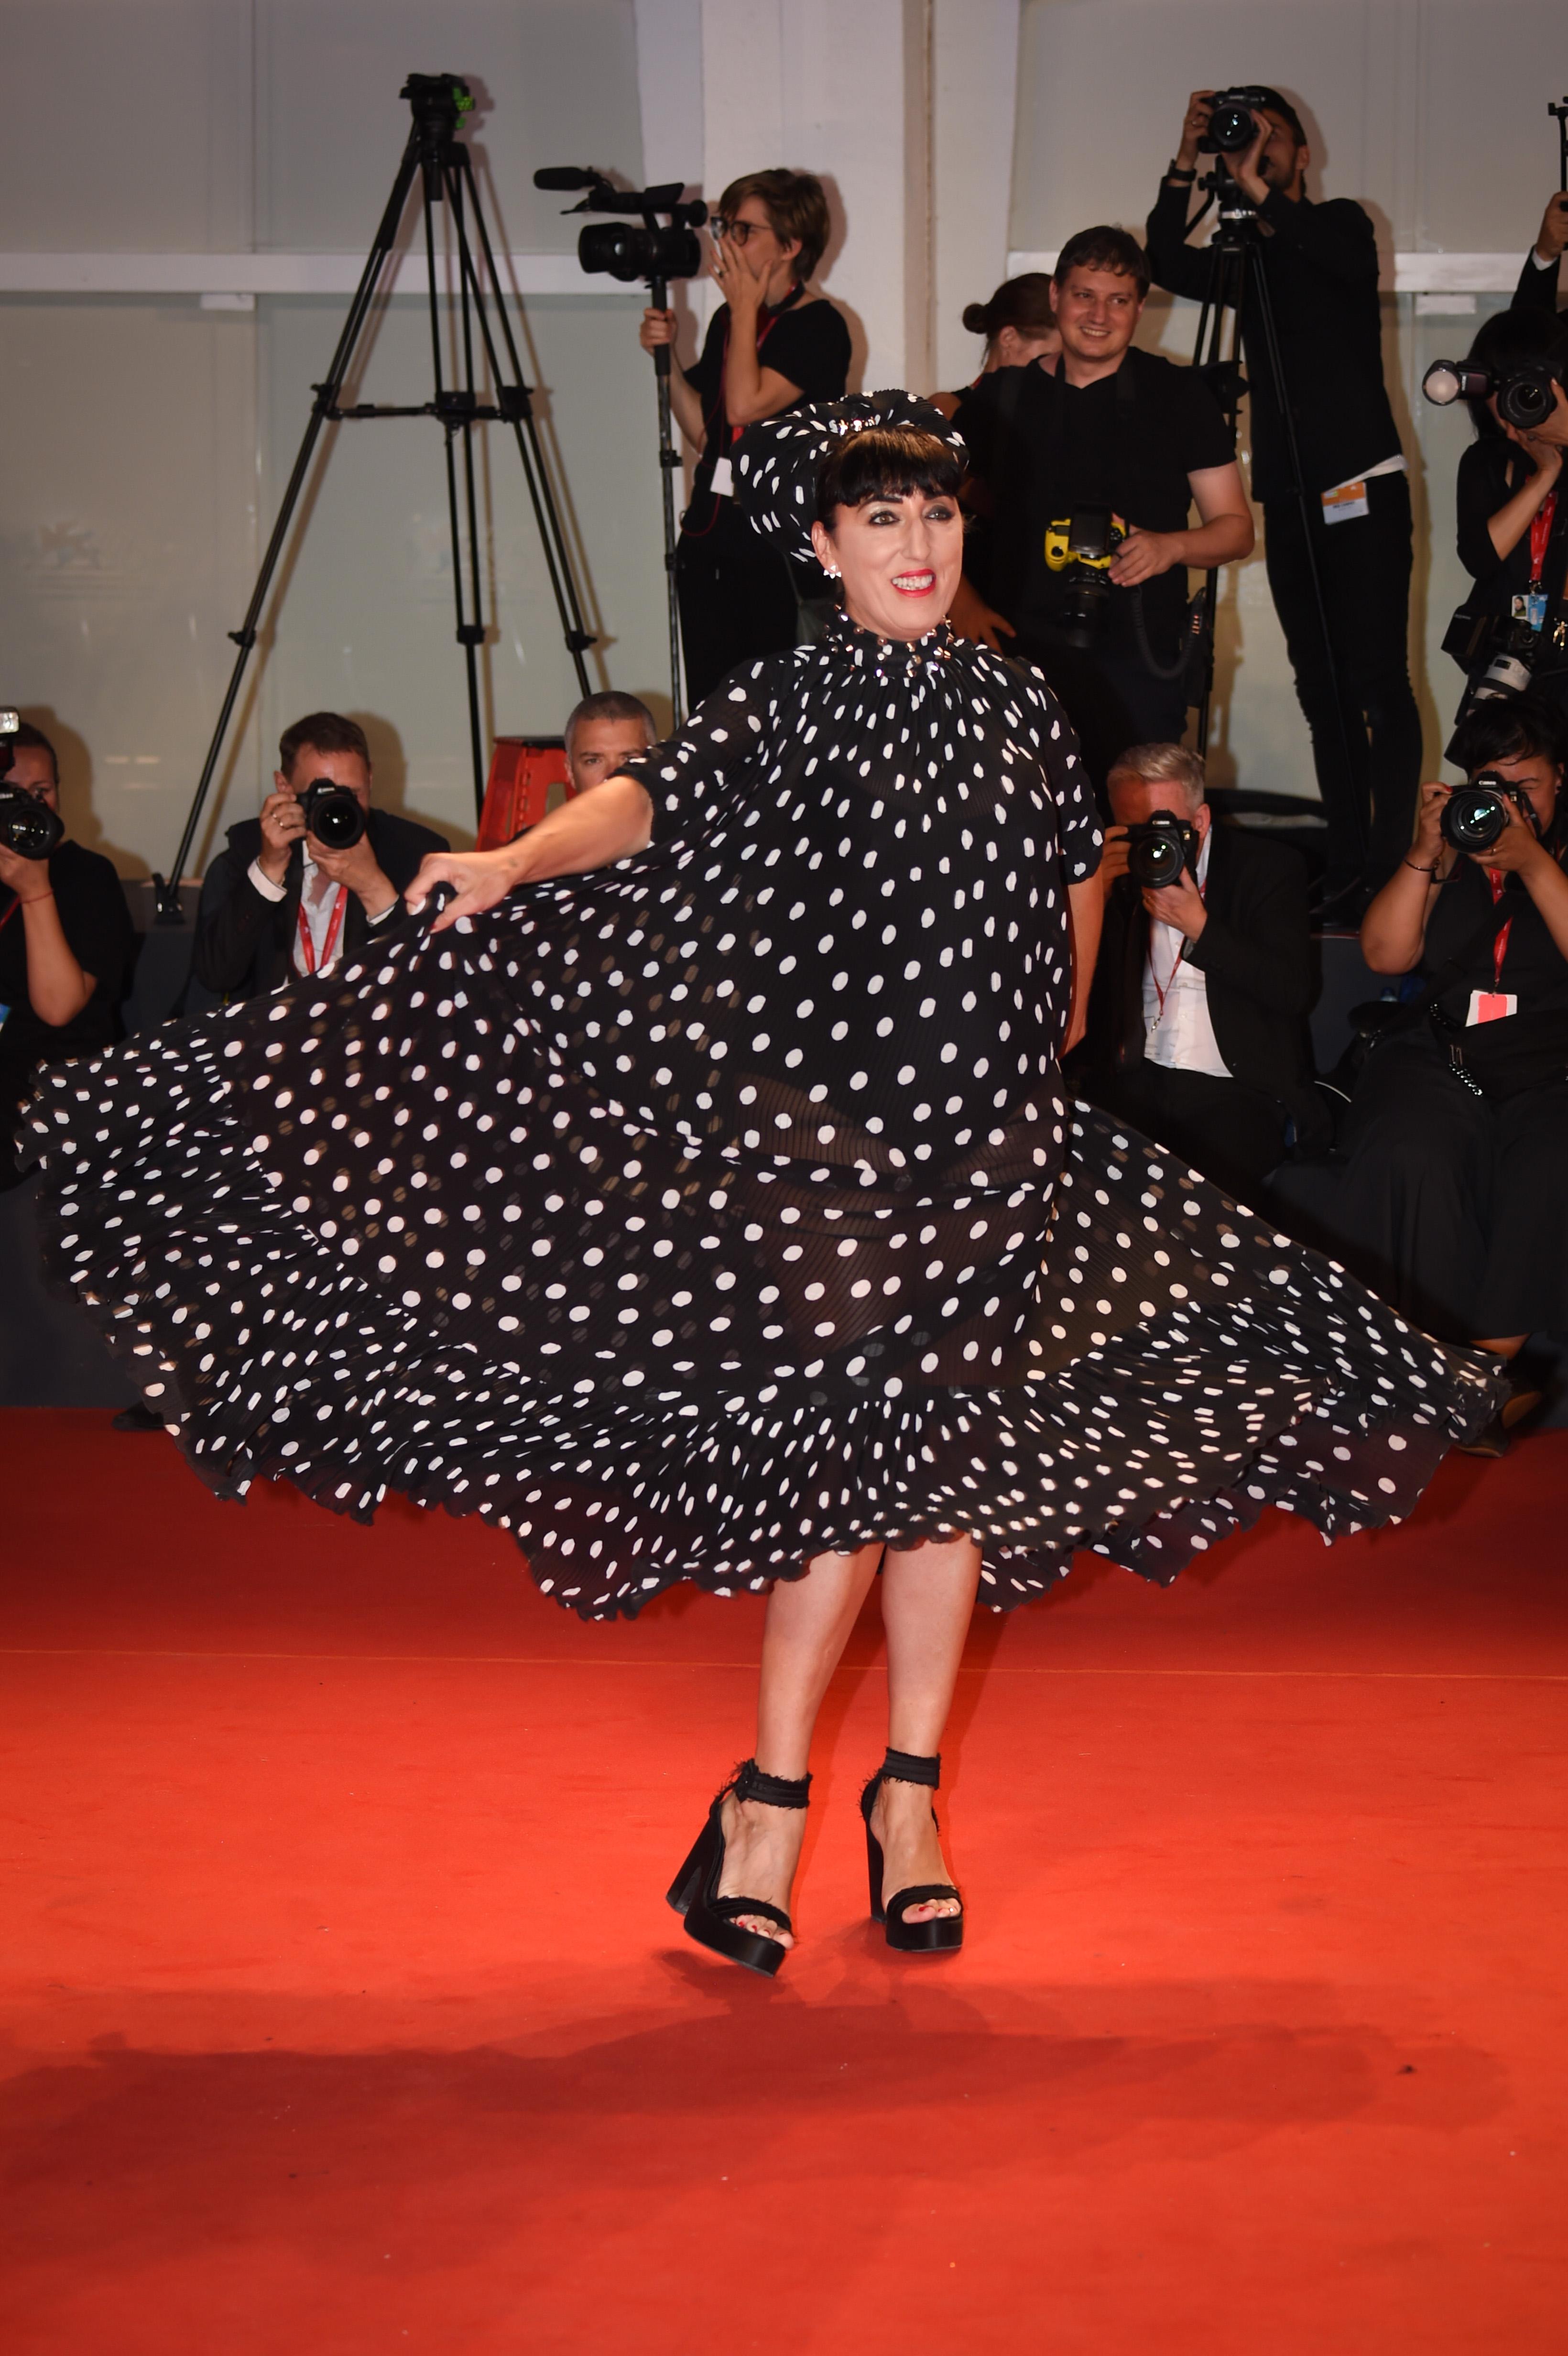 Kineo Prize Red Carpet Arrivals - The 76th Venice Film Festival